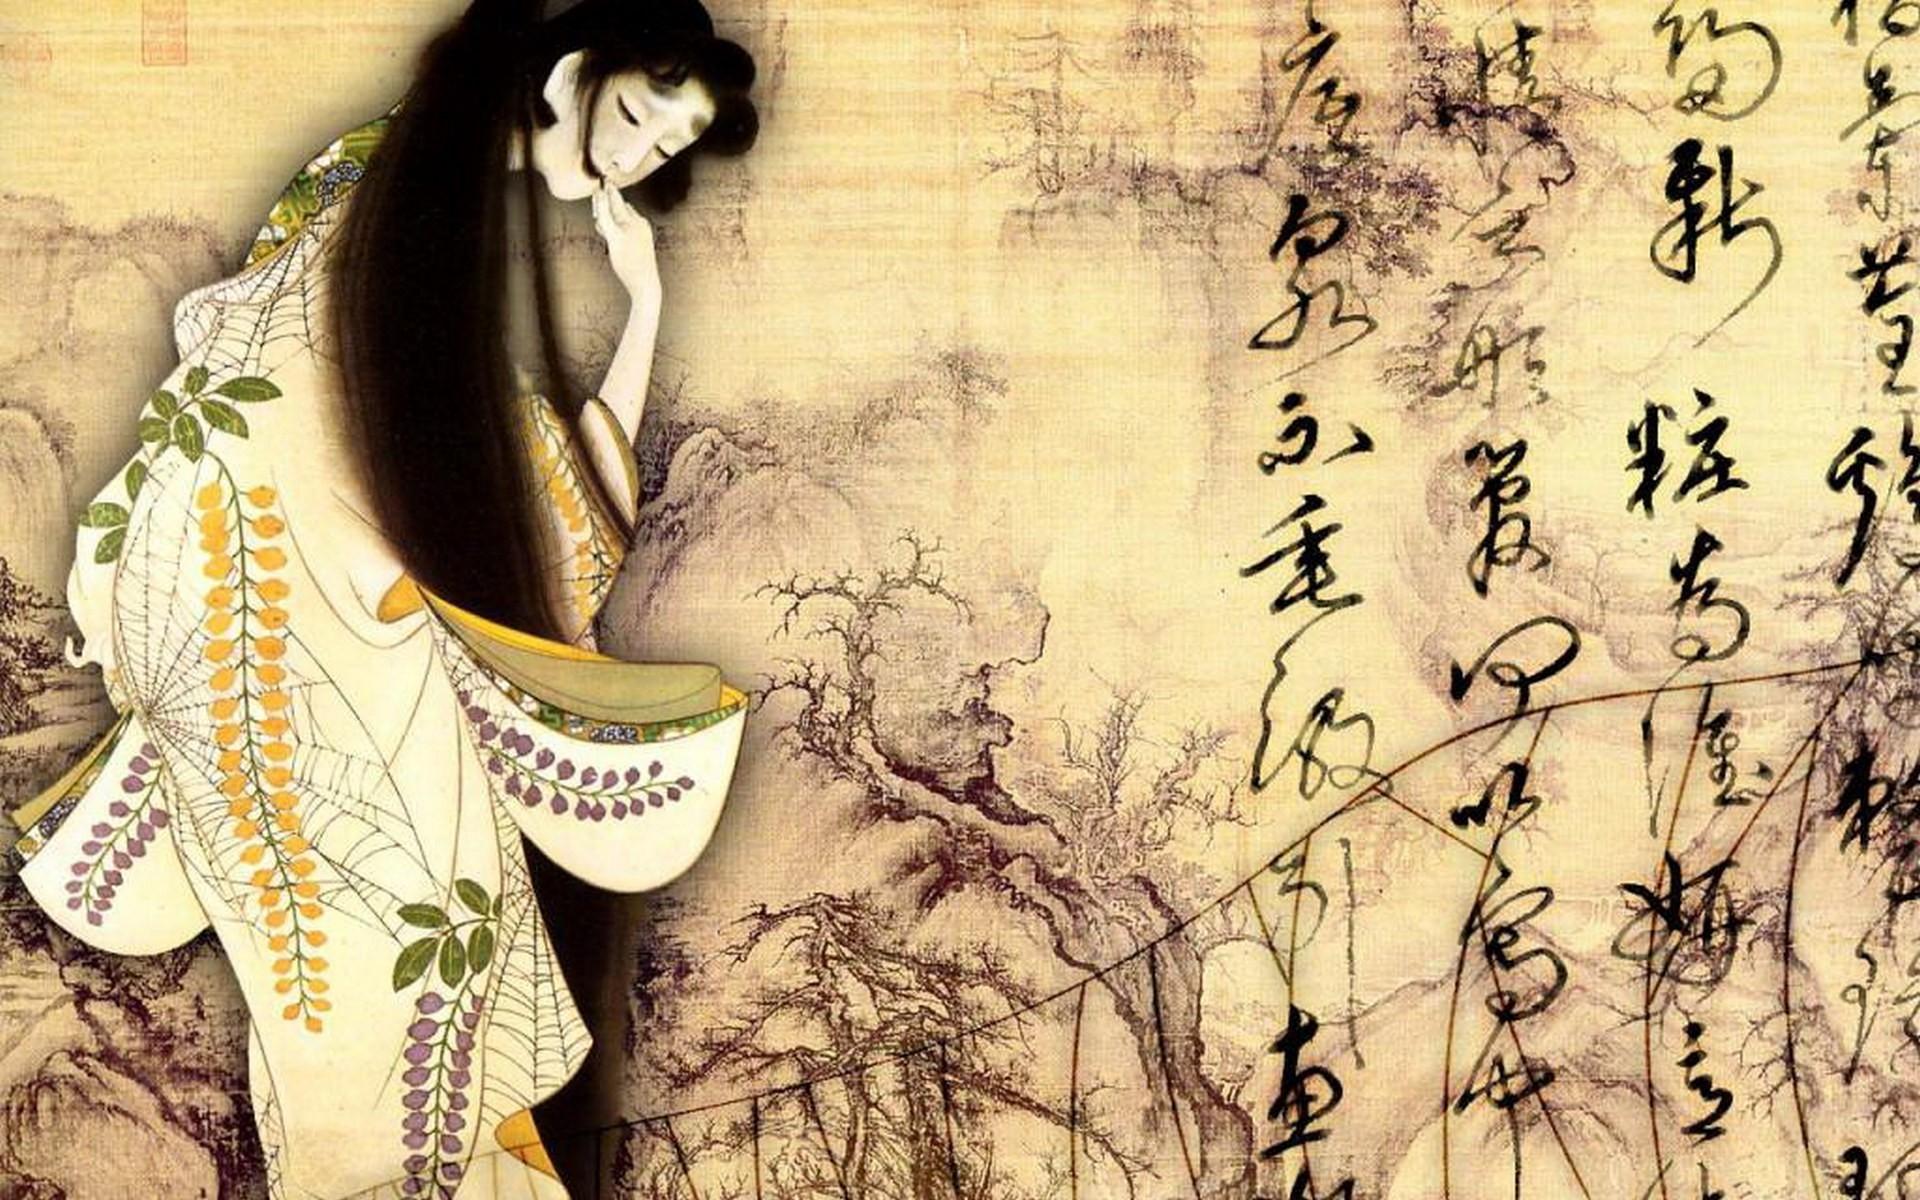 Cute wallpapers selection – Paper Kawaii | Download Wallpaper | Pinterest |  Japan illustration, Kawaii and Wallpaper